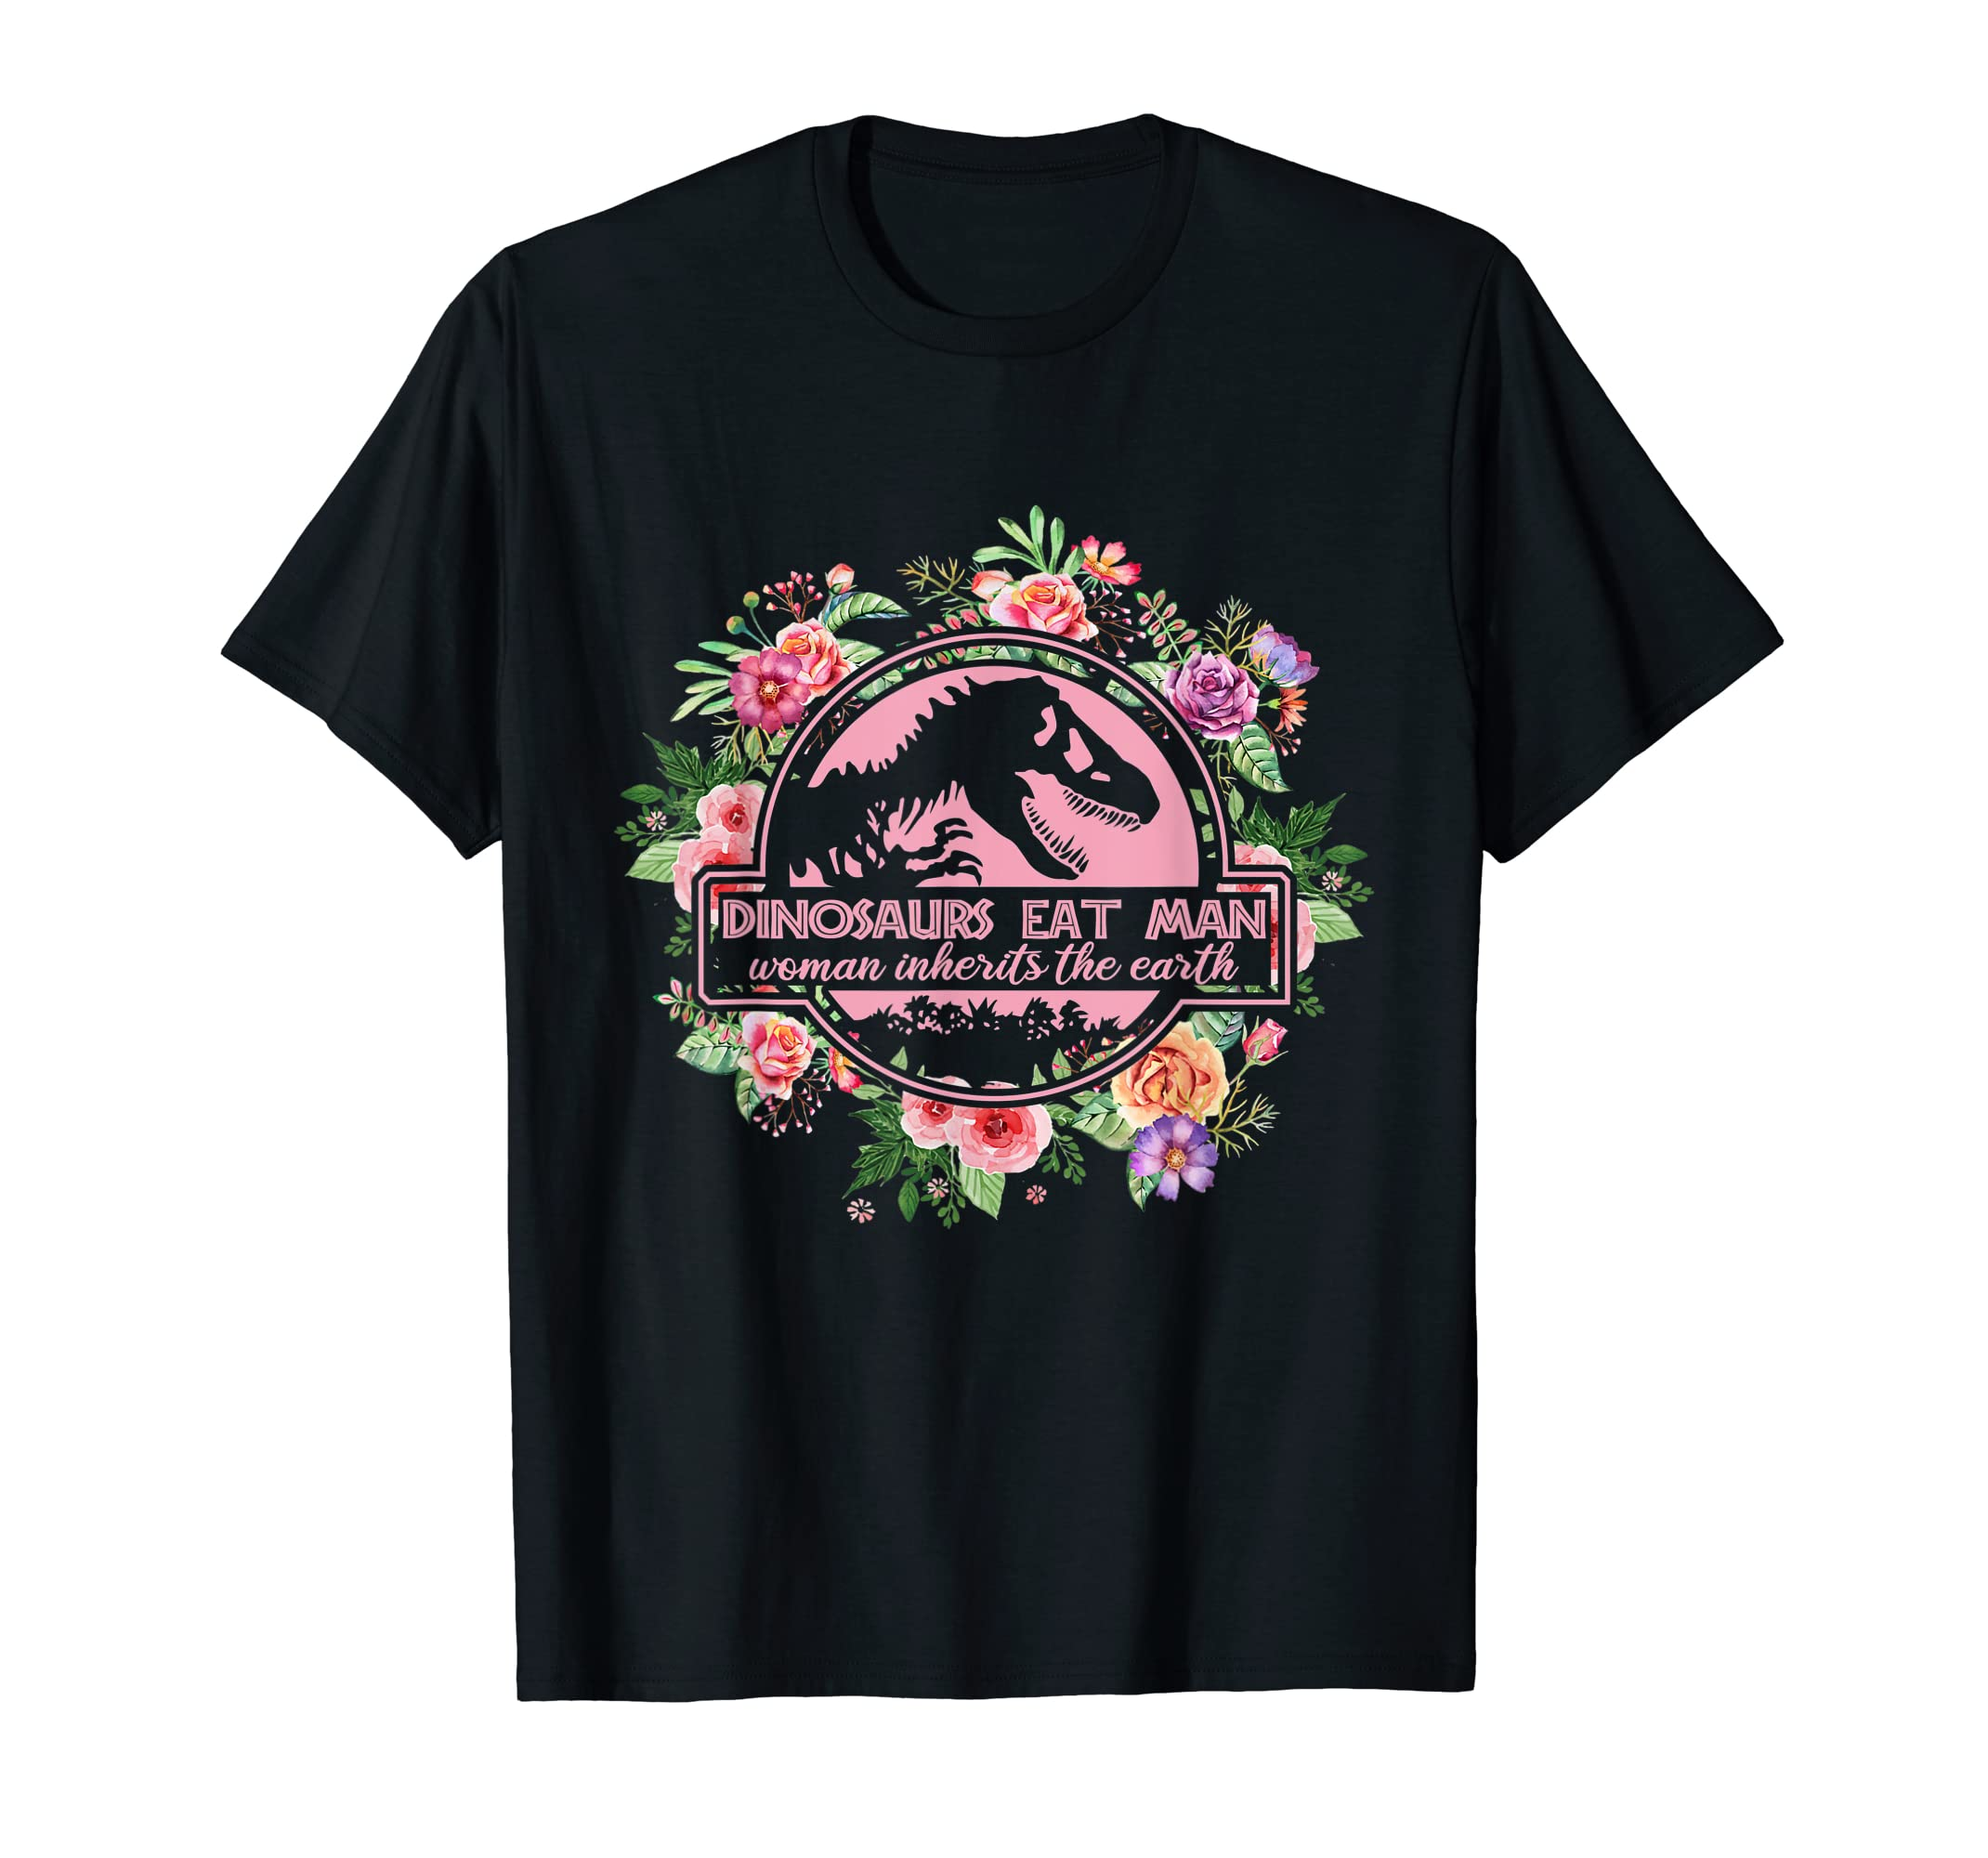 Dinosaurs Eat Man Woman Inherits the Earth Flower T-shirt-Men's T-Shirt-Black